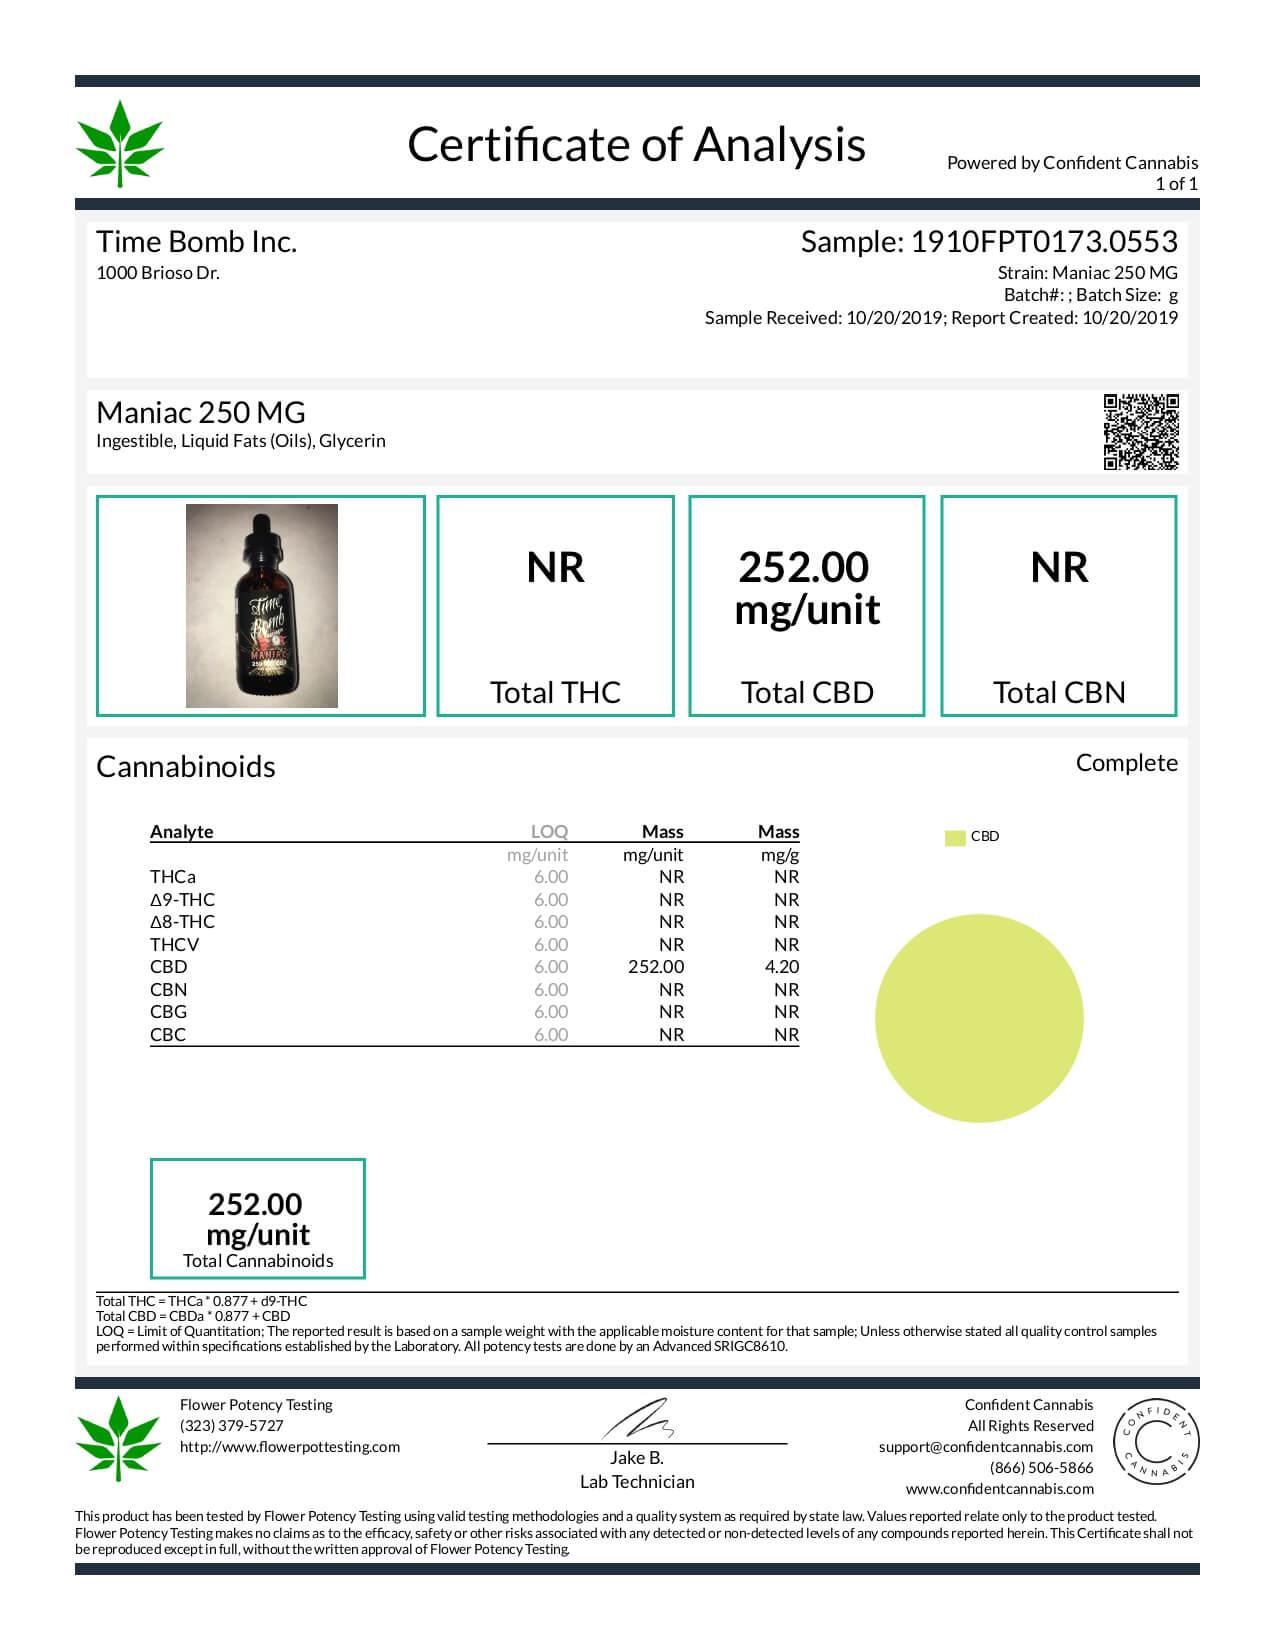 Time Bomb Extracts CBD Vape Juice Maniac 250mg Lab Report